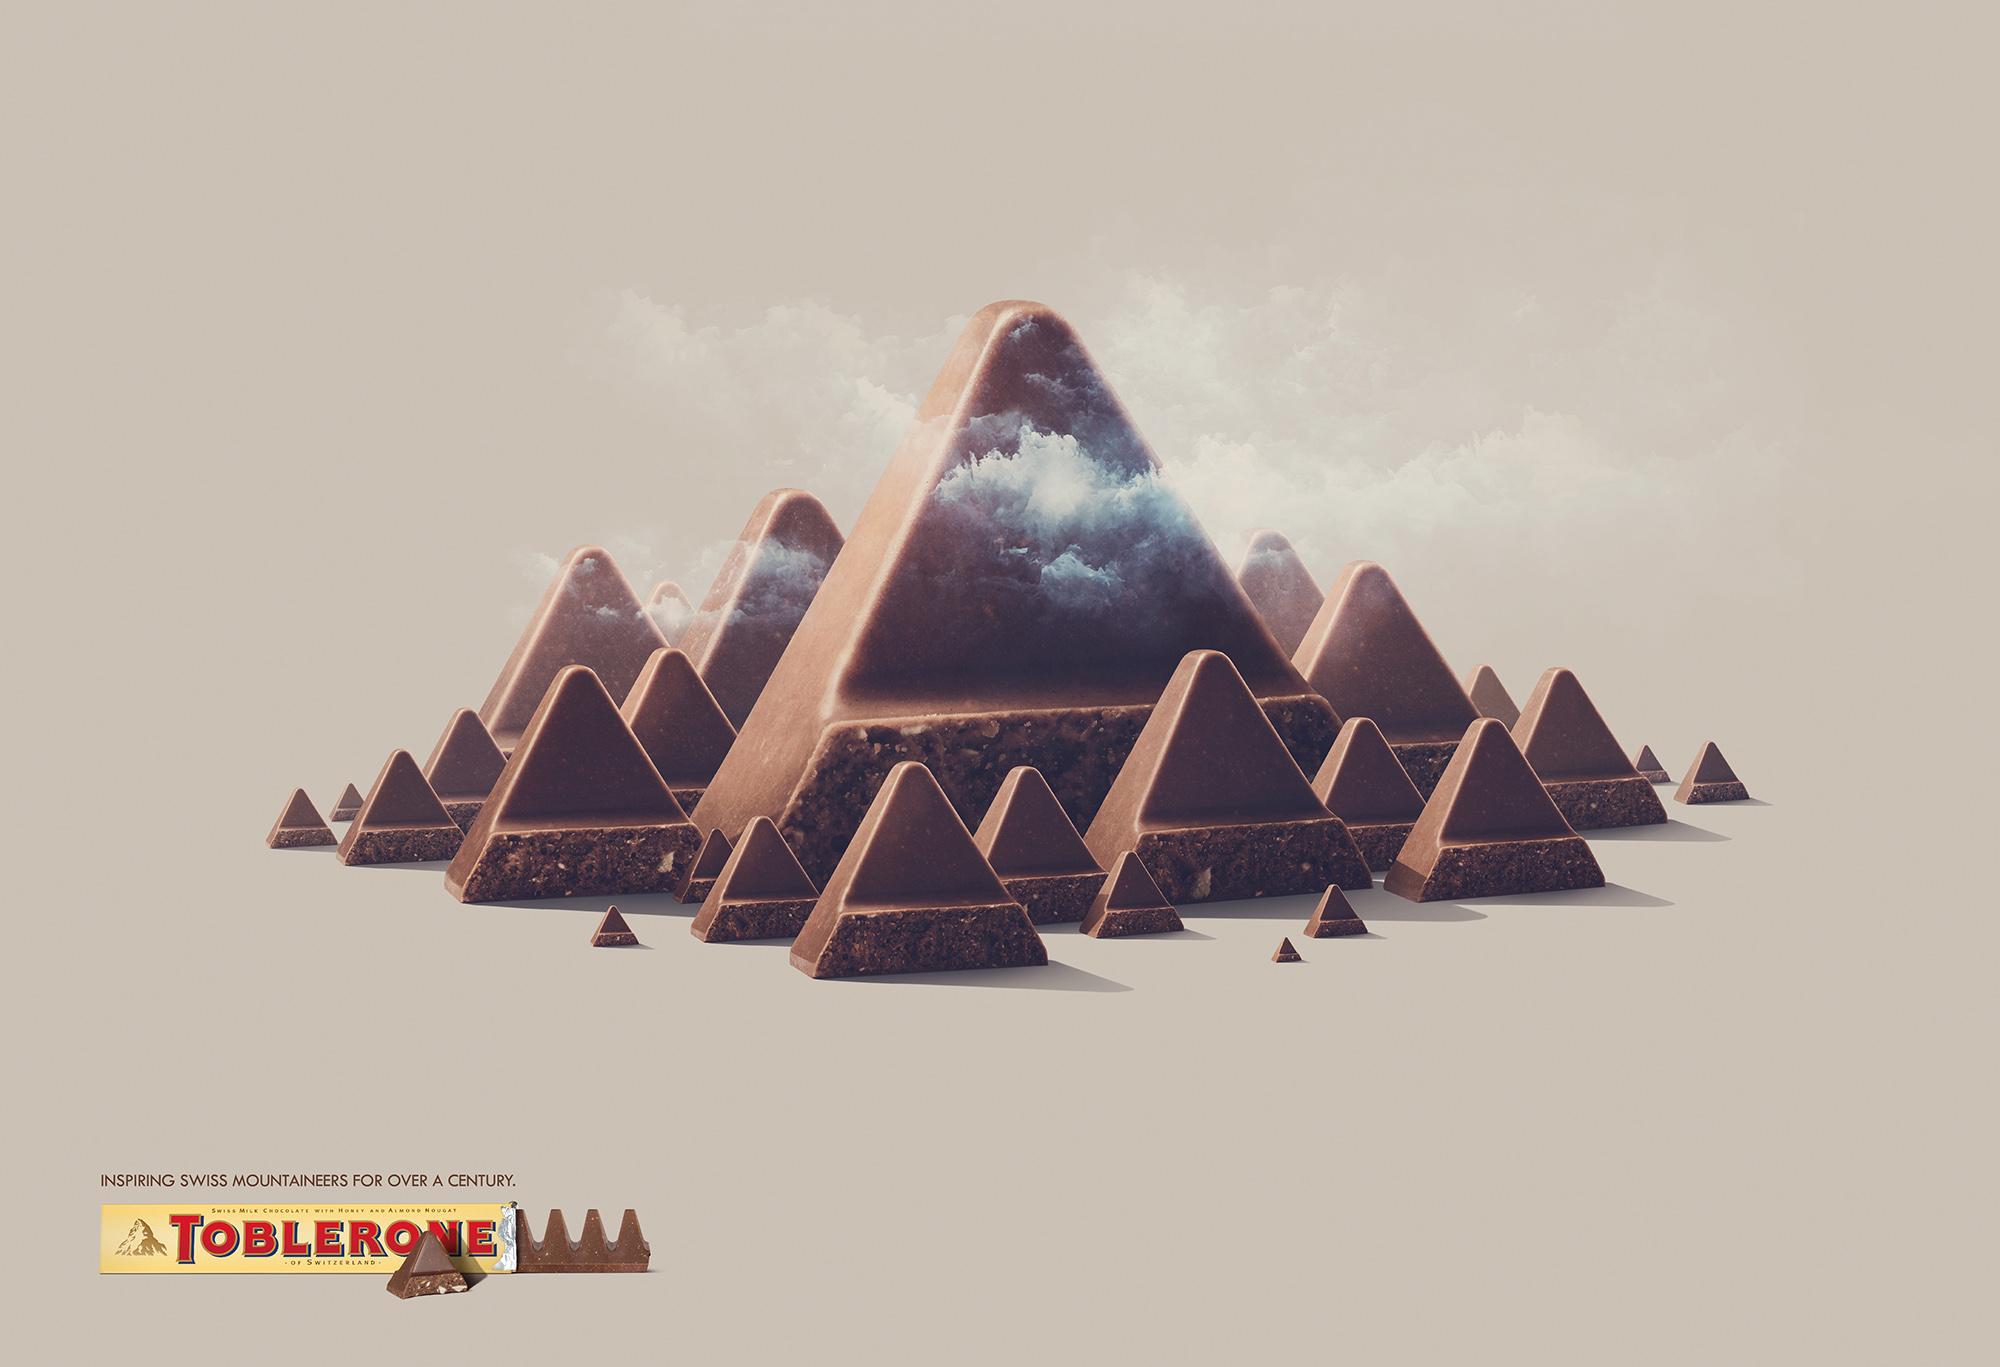 Toblerone - Mountaineers